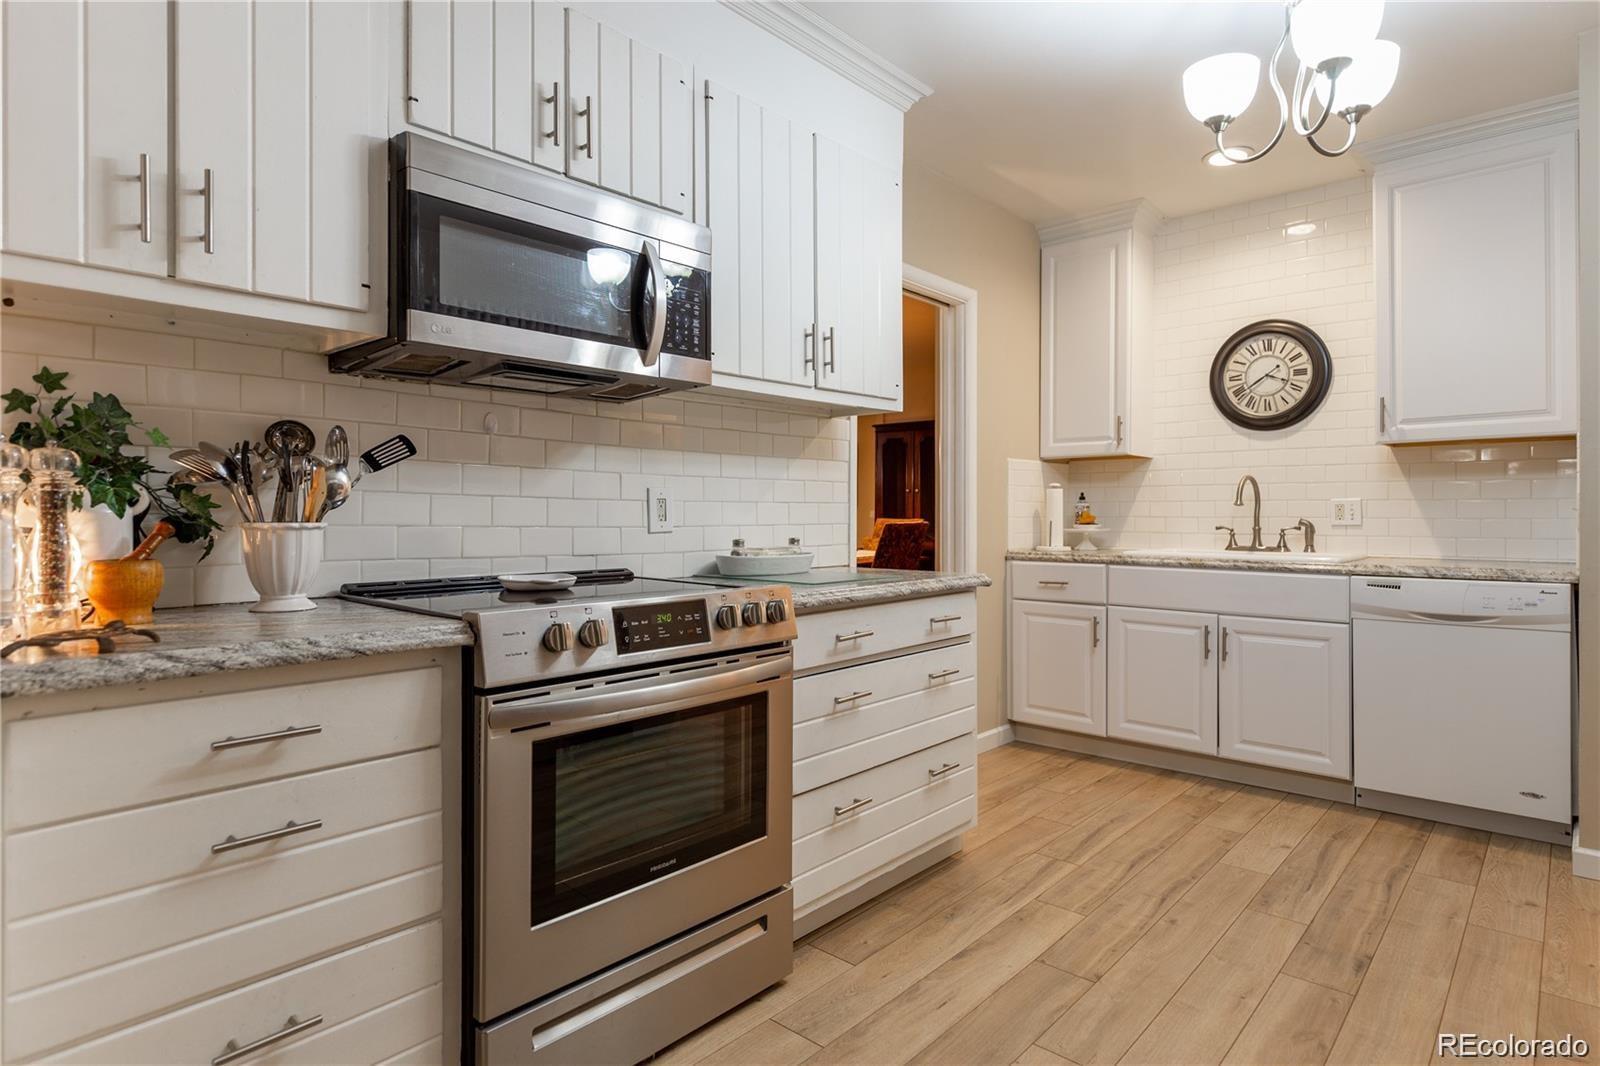 7201 W Bayaud Place, Lakewood, CO 80226 - Lakewood, CO real estate listing